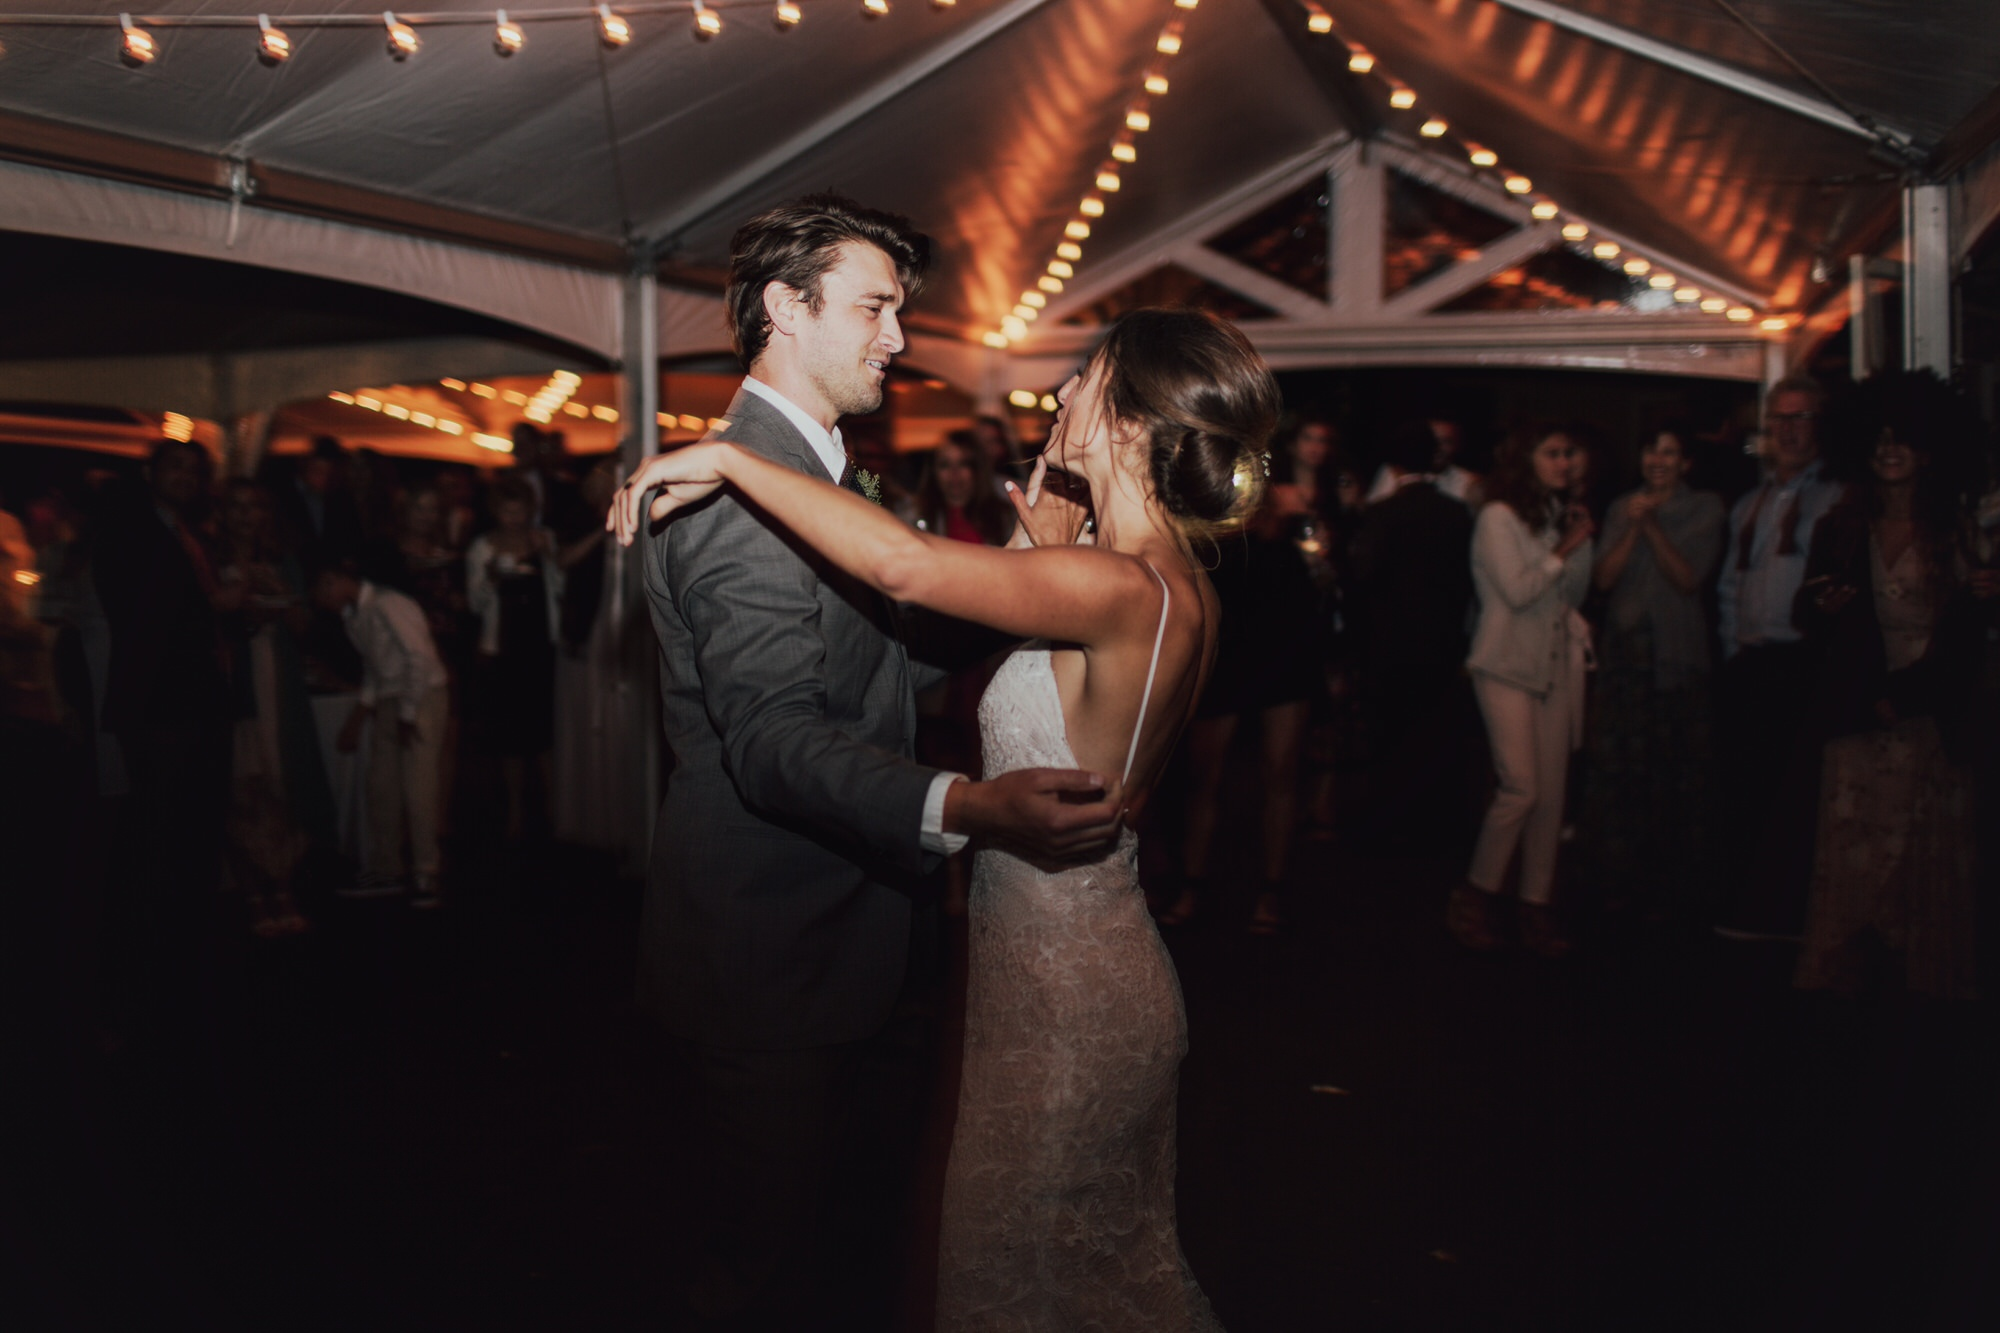 emily-aaron-rochester-new-york-wedding-photographer-124.JPG